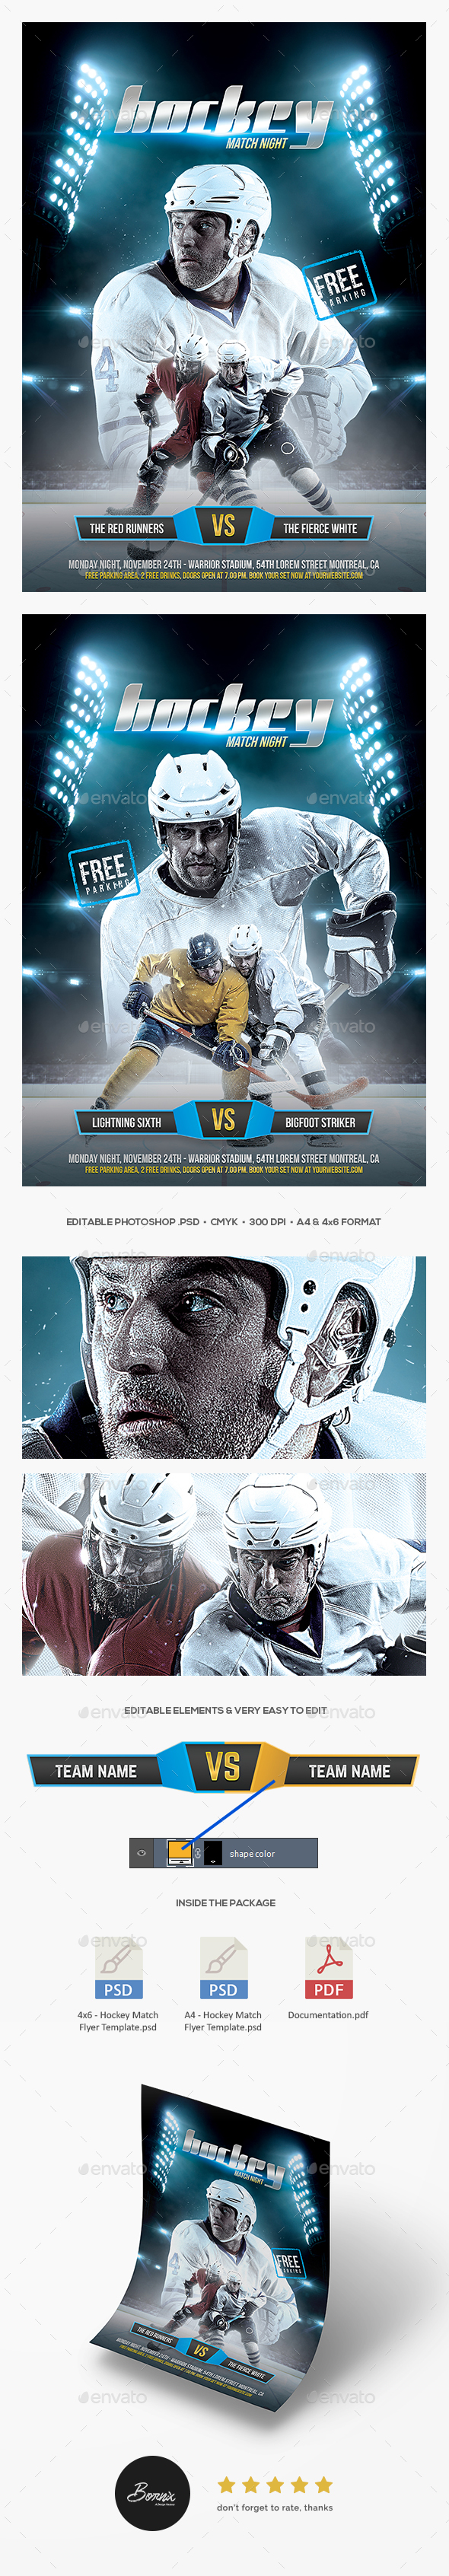 GraphicRiver Hockey Match Flyer 20573079